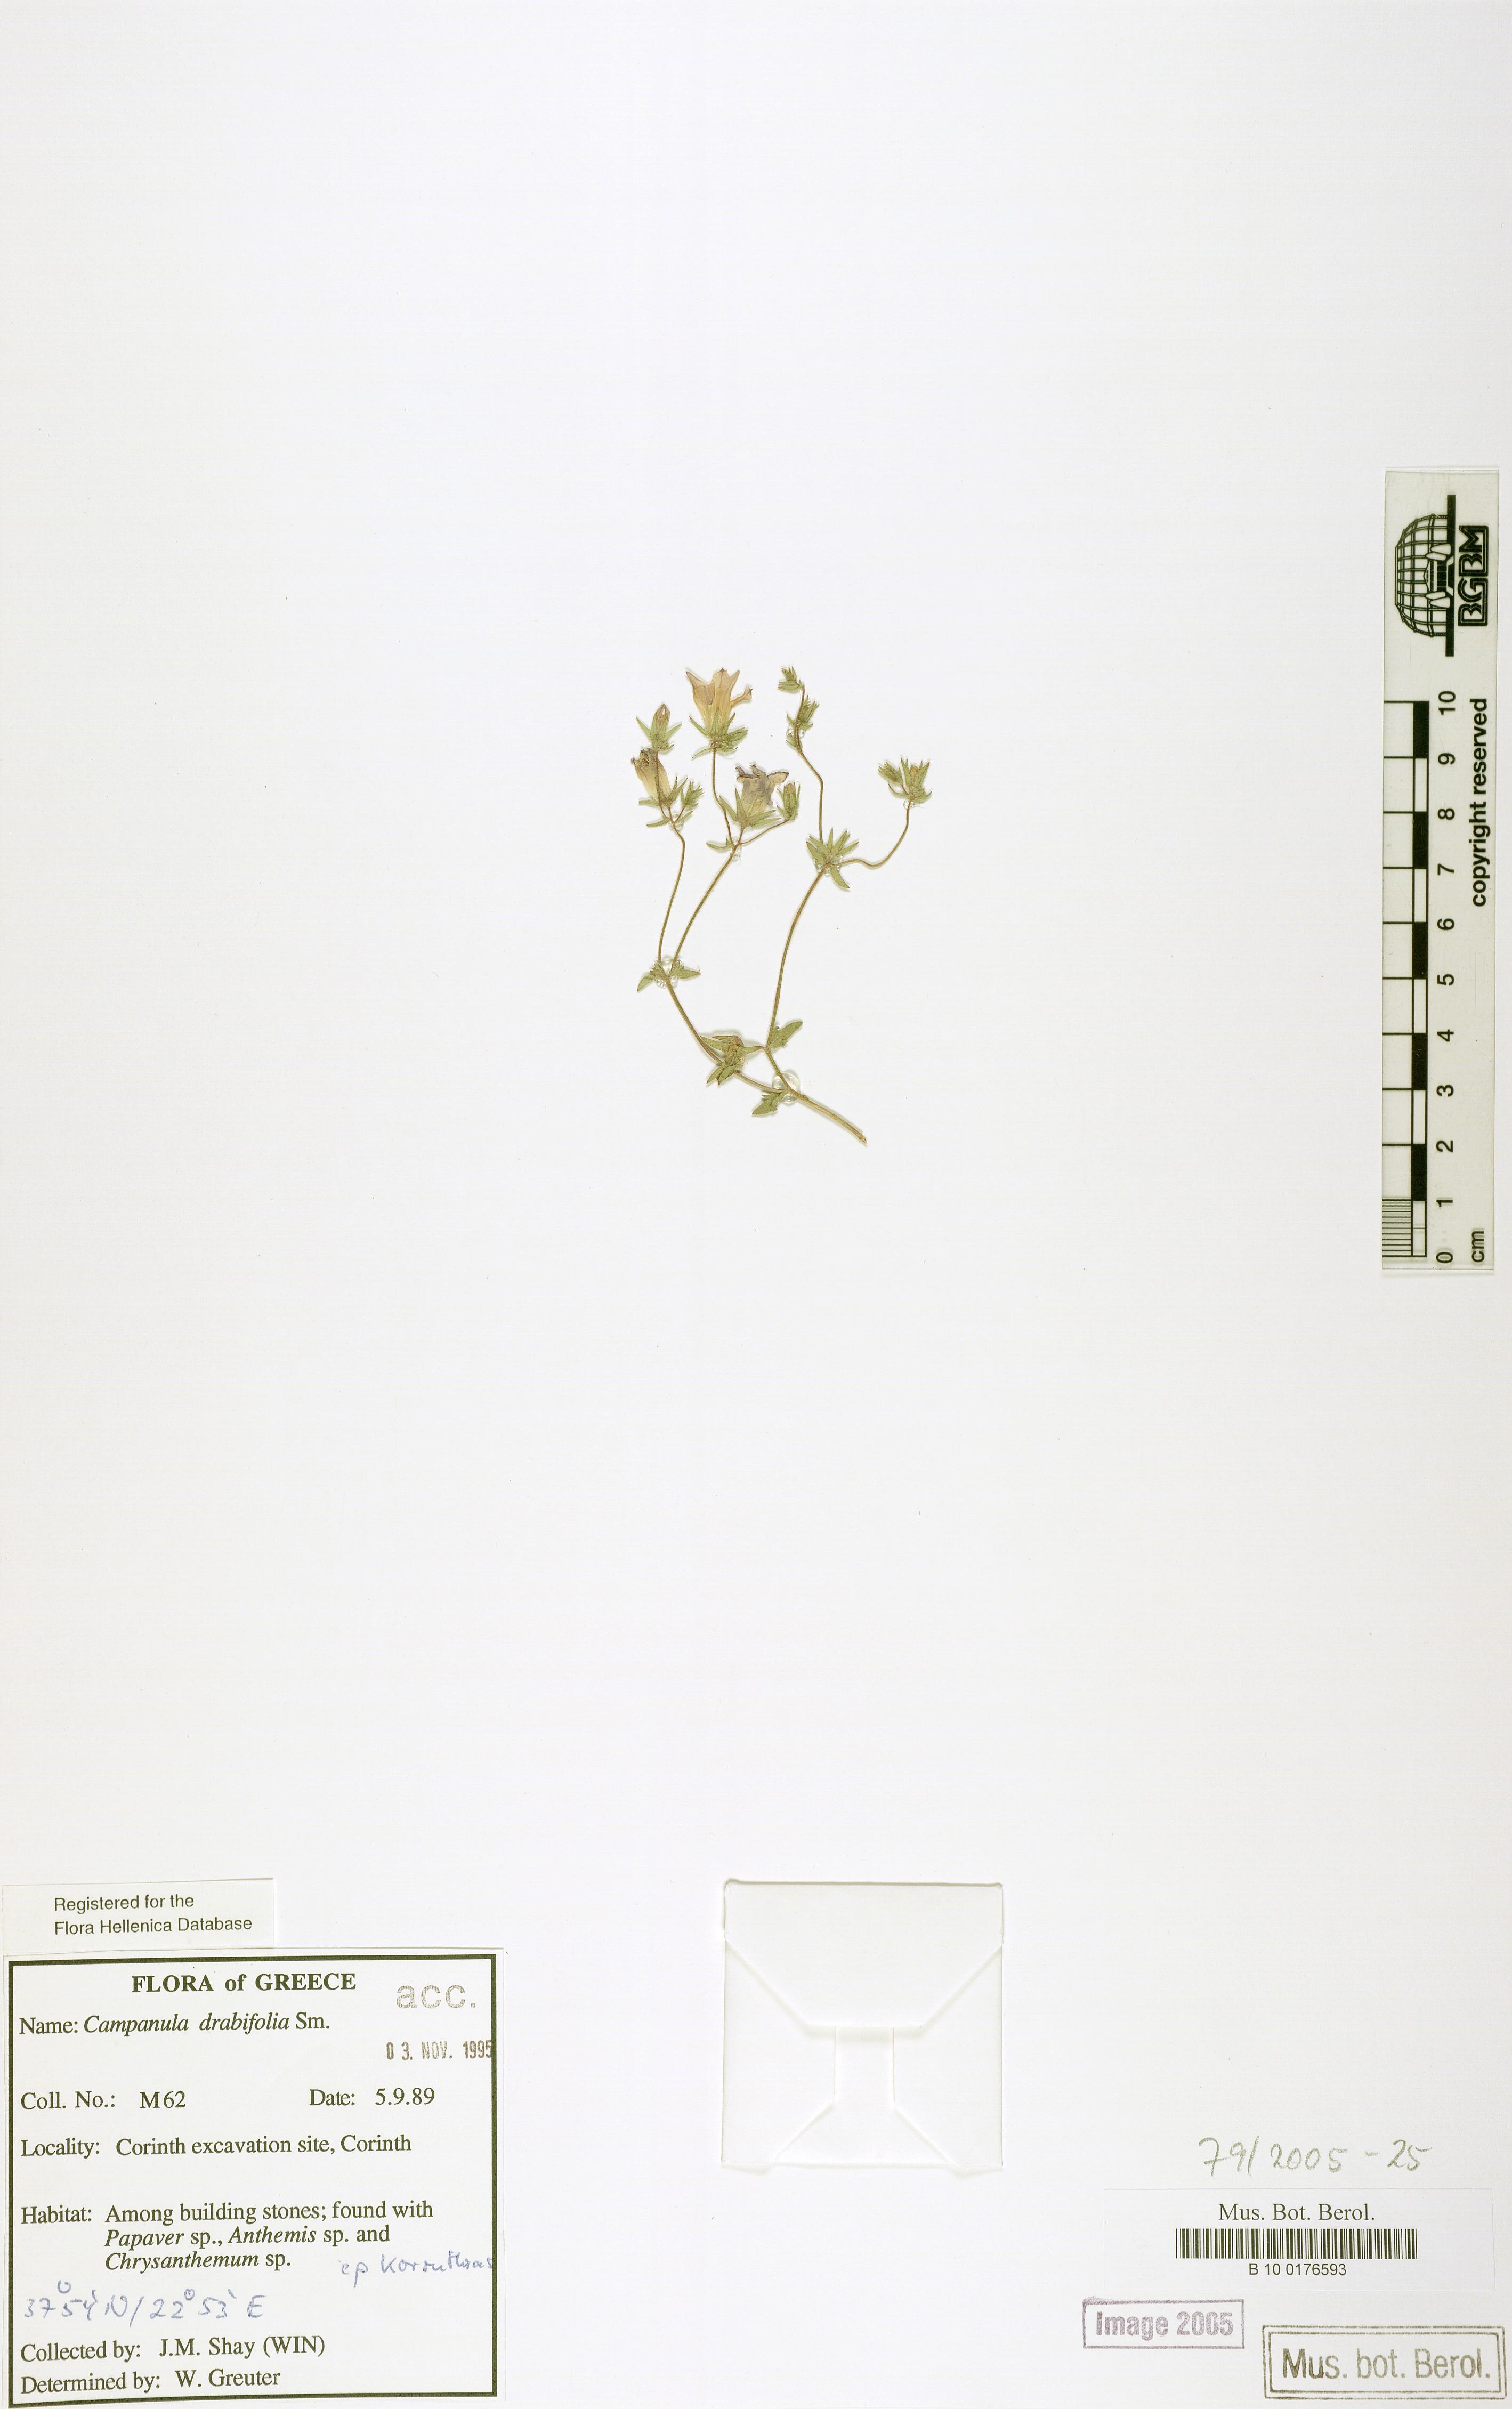 http://ww2.bgbm.org/herbarium/images/B/10/01/76/59/B_10_0176593.jpg